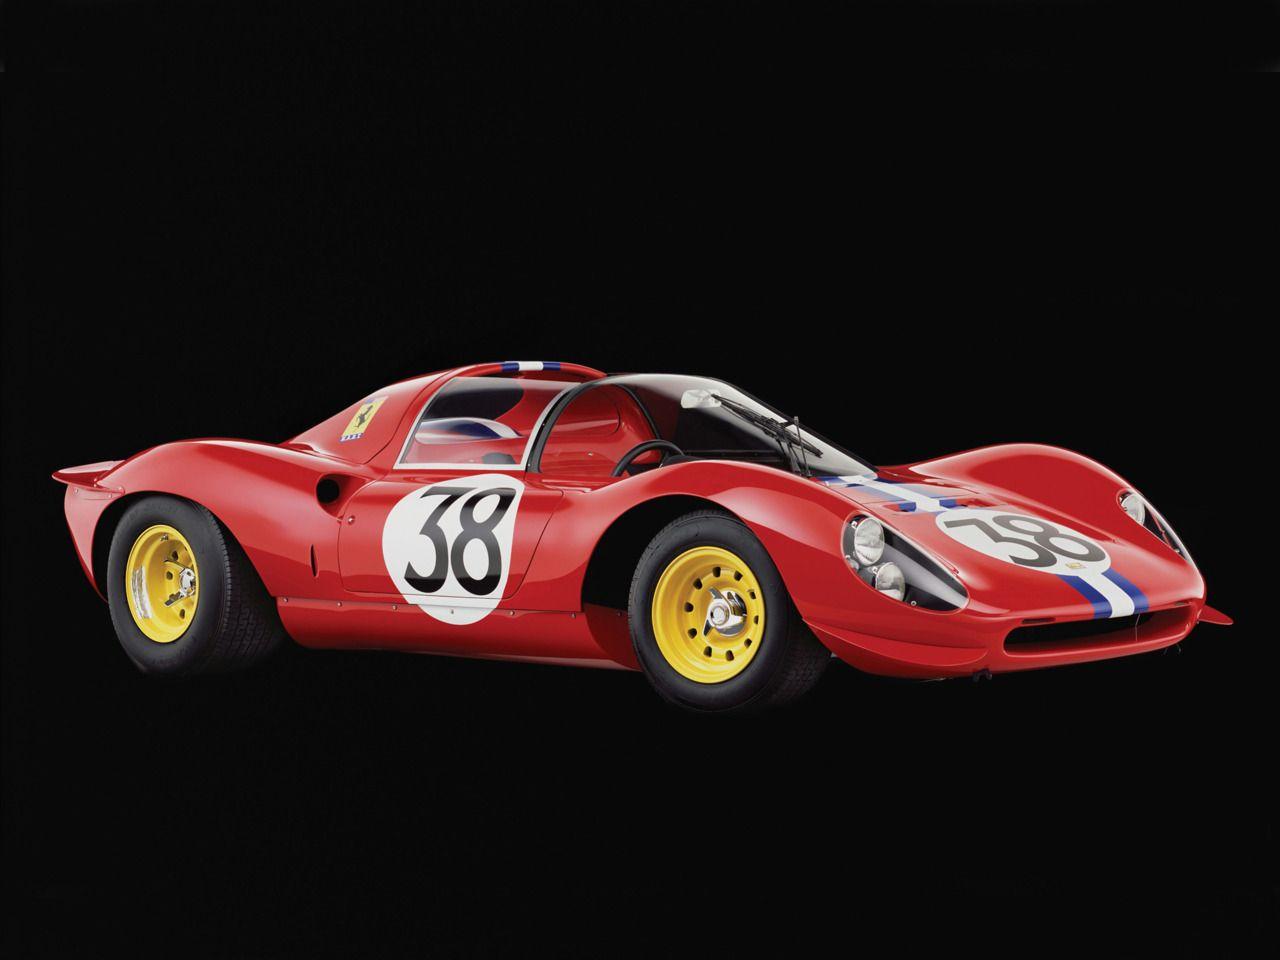 1966 Ferrari Dino 206 Sp Ferrari Racing Ferrari Sport Cars